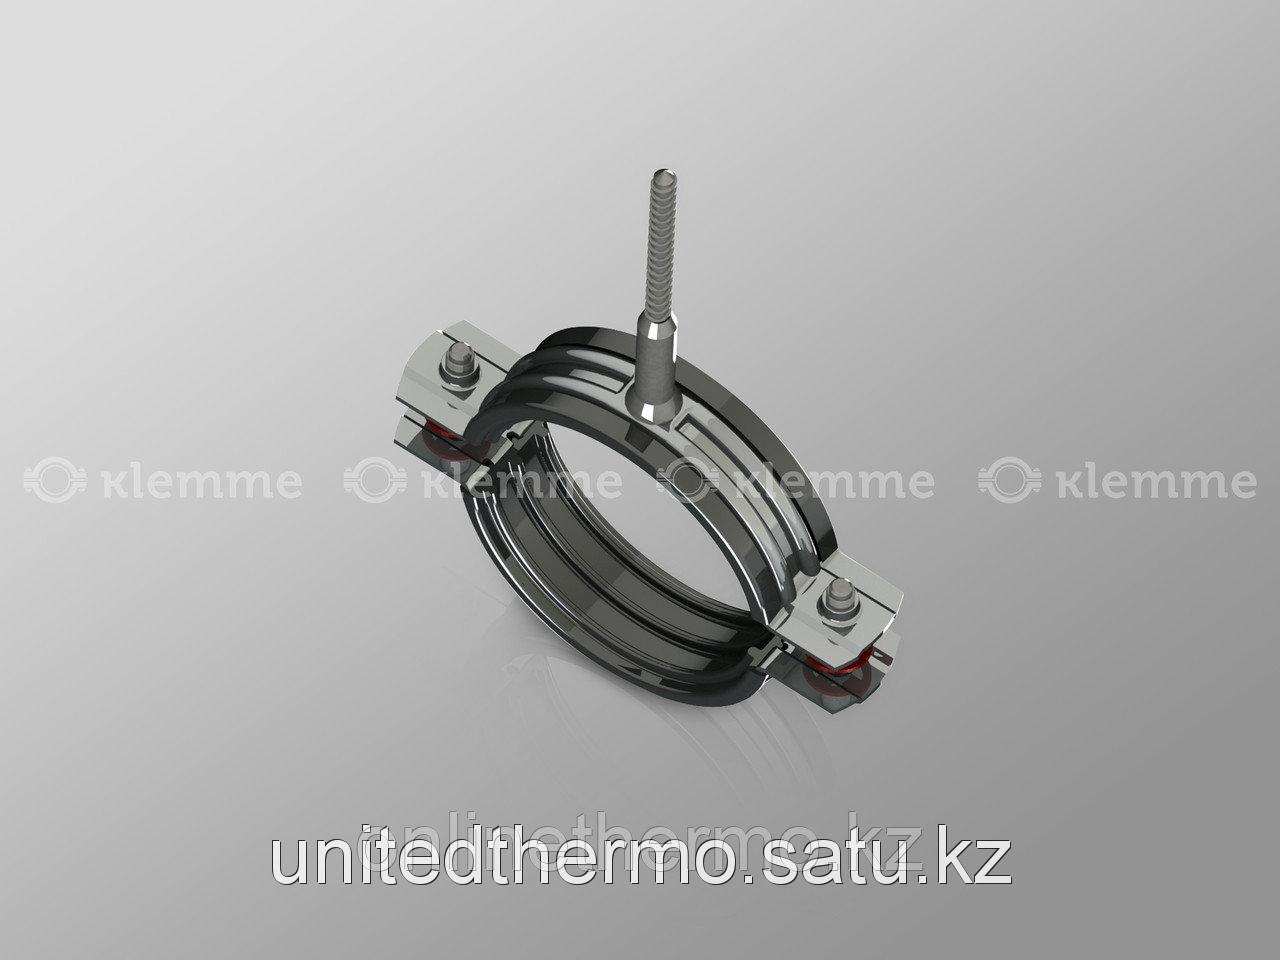 "Хомут 3"" (М10) для труб с резиновым профилем и шурупом 85-92 мм - фото 1"